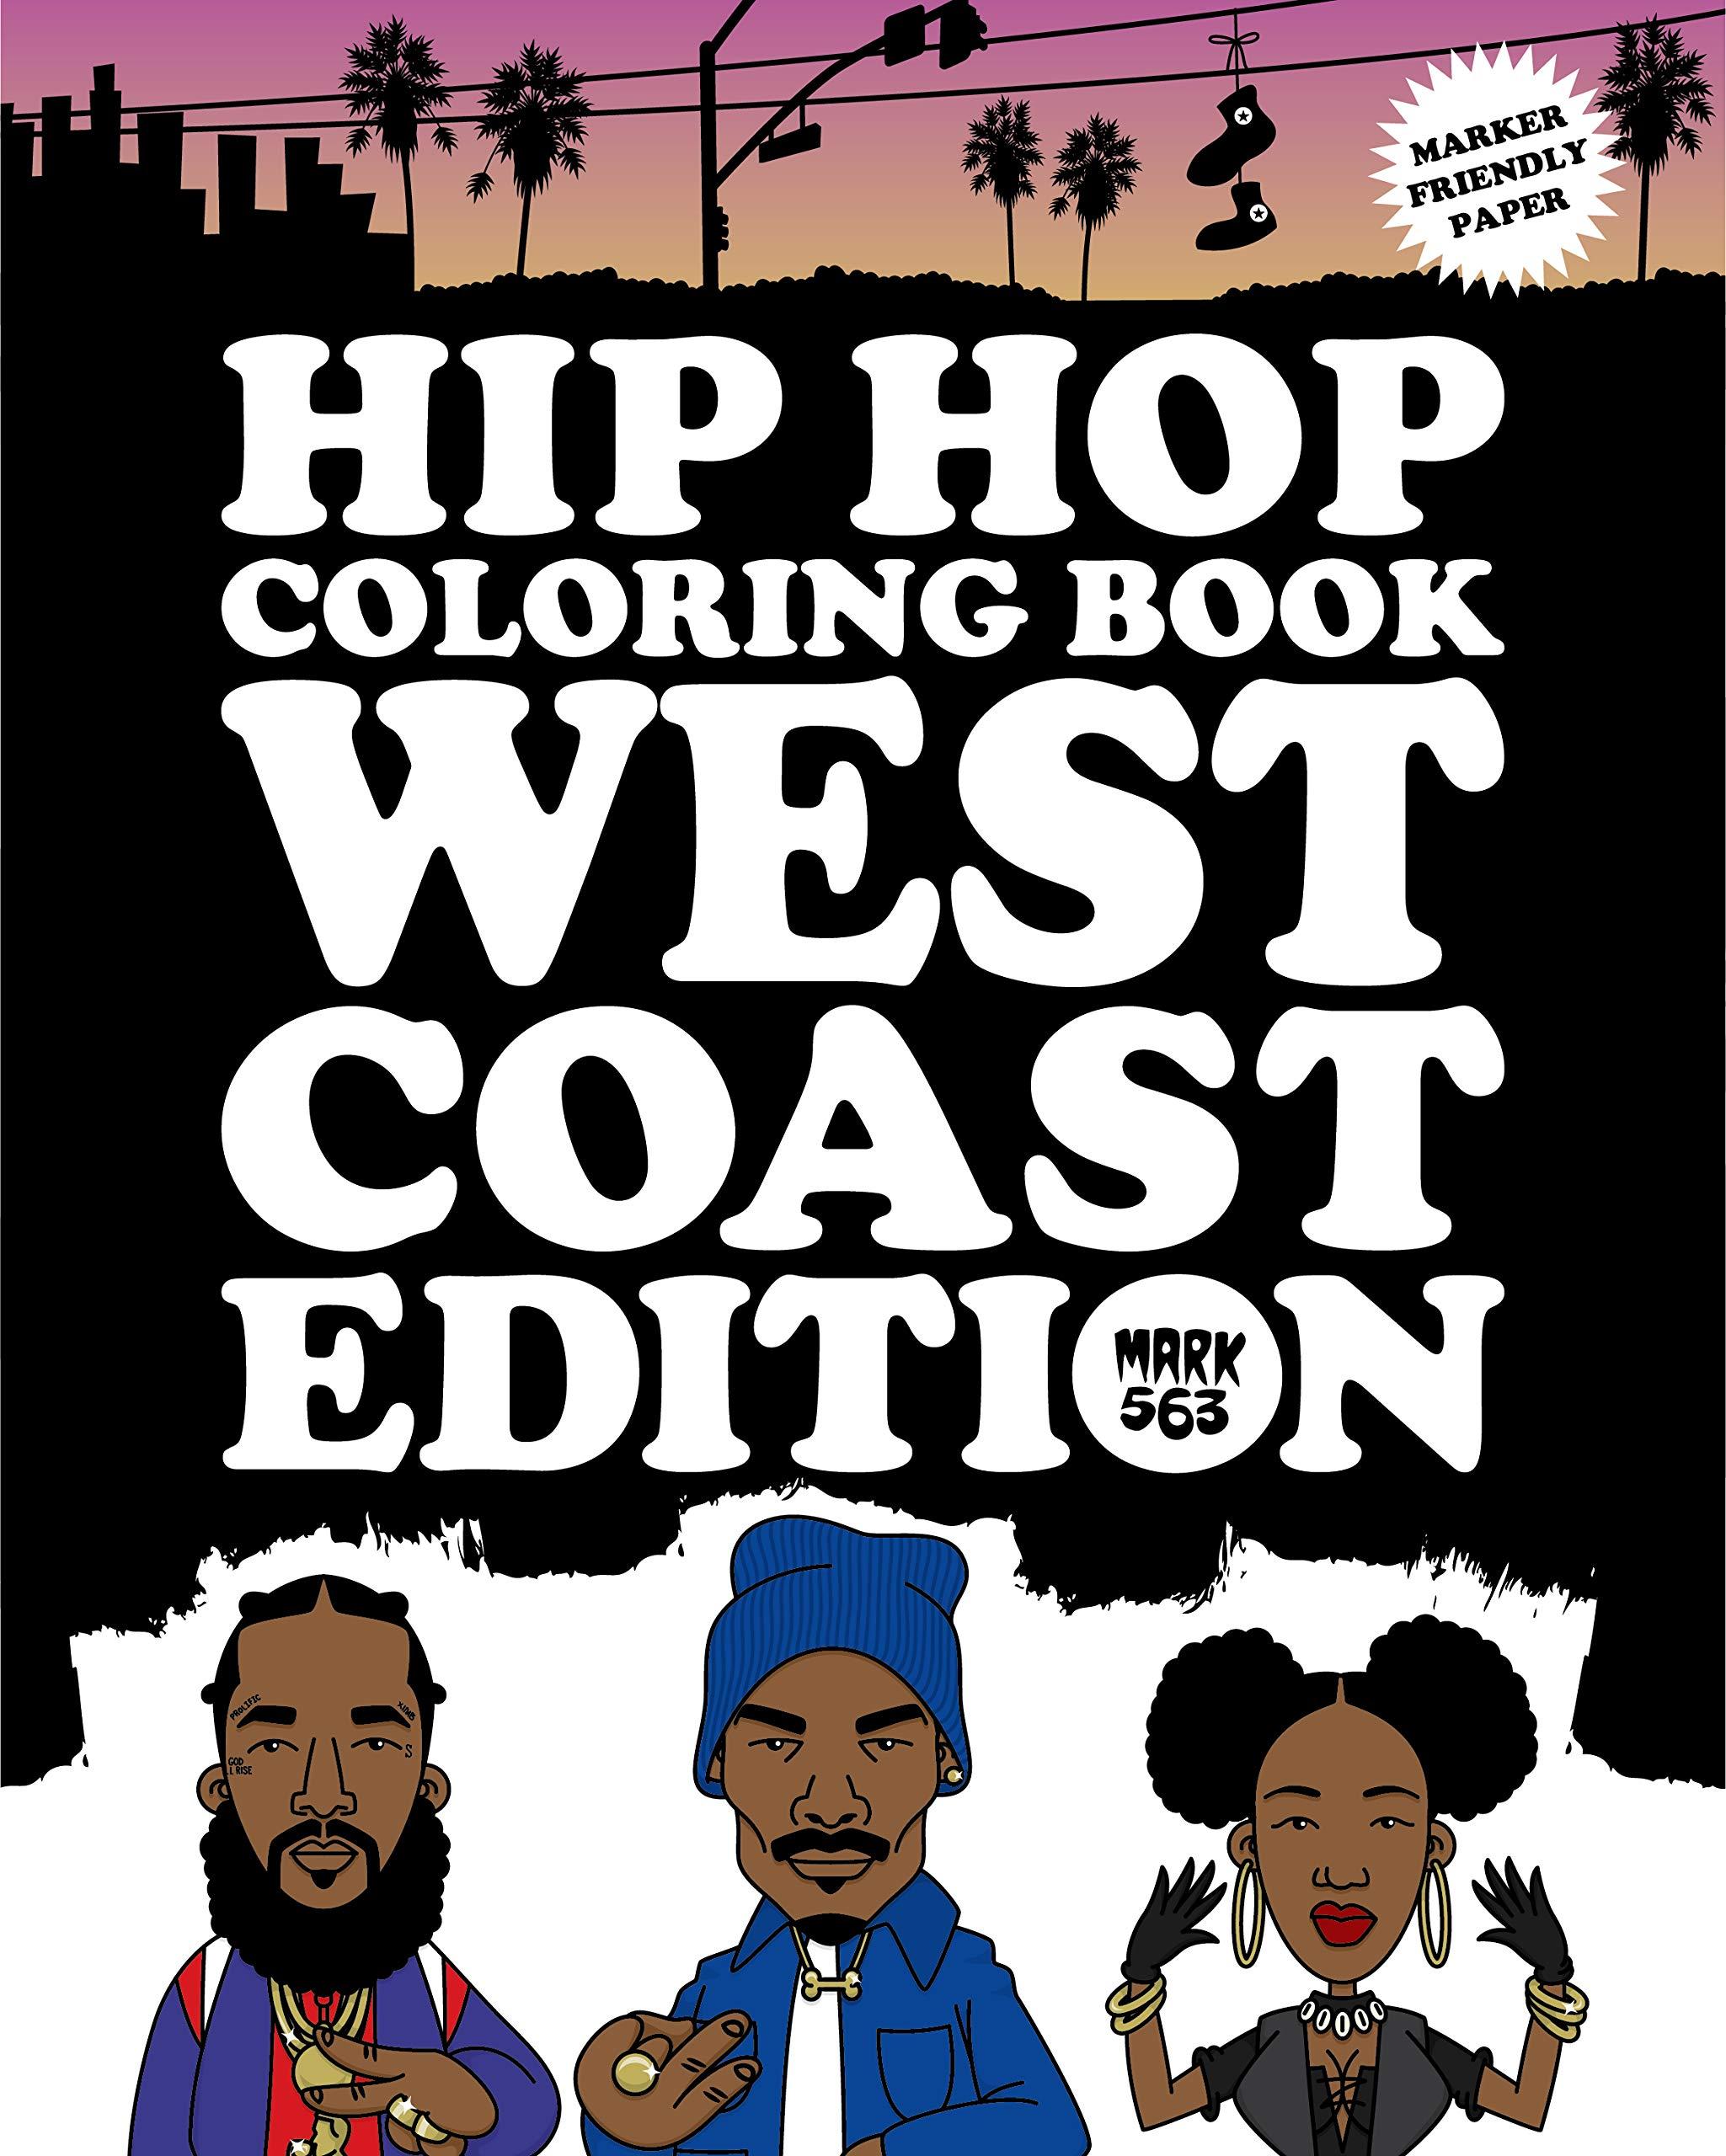 Hip Hop Coloring Book West Coast Edition Amazon De Mark 563 Fremdsprachige Bucher